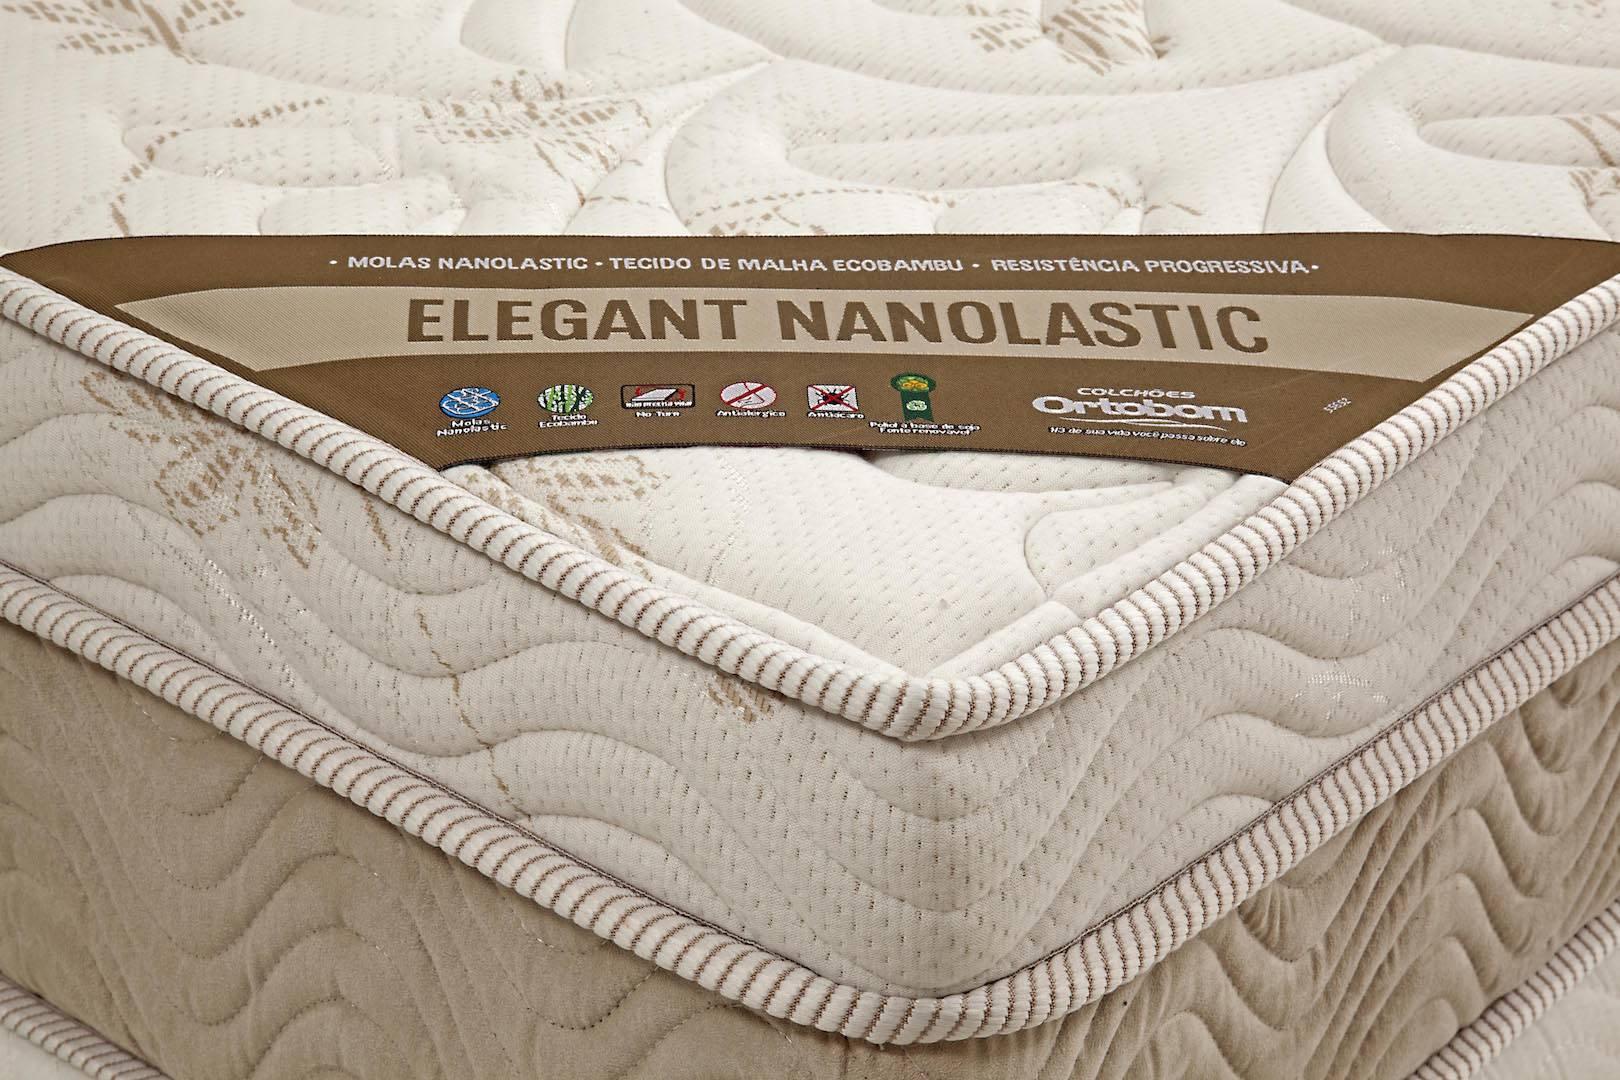 Colchao Elegant Nanolastic Super King 193 cm (LARG) Creme e Branco - 42568